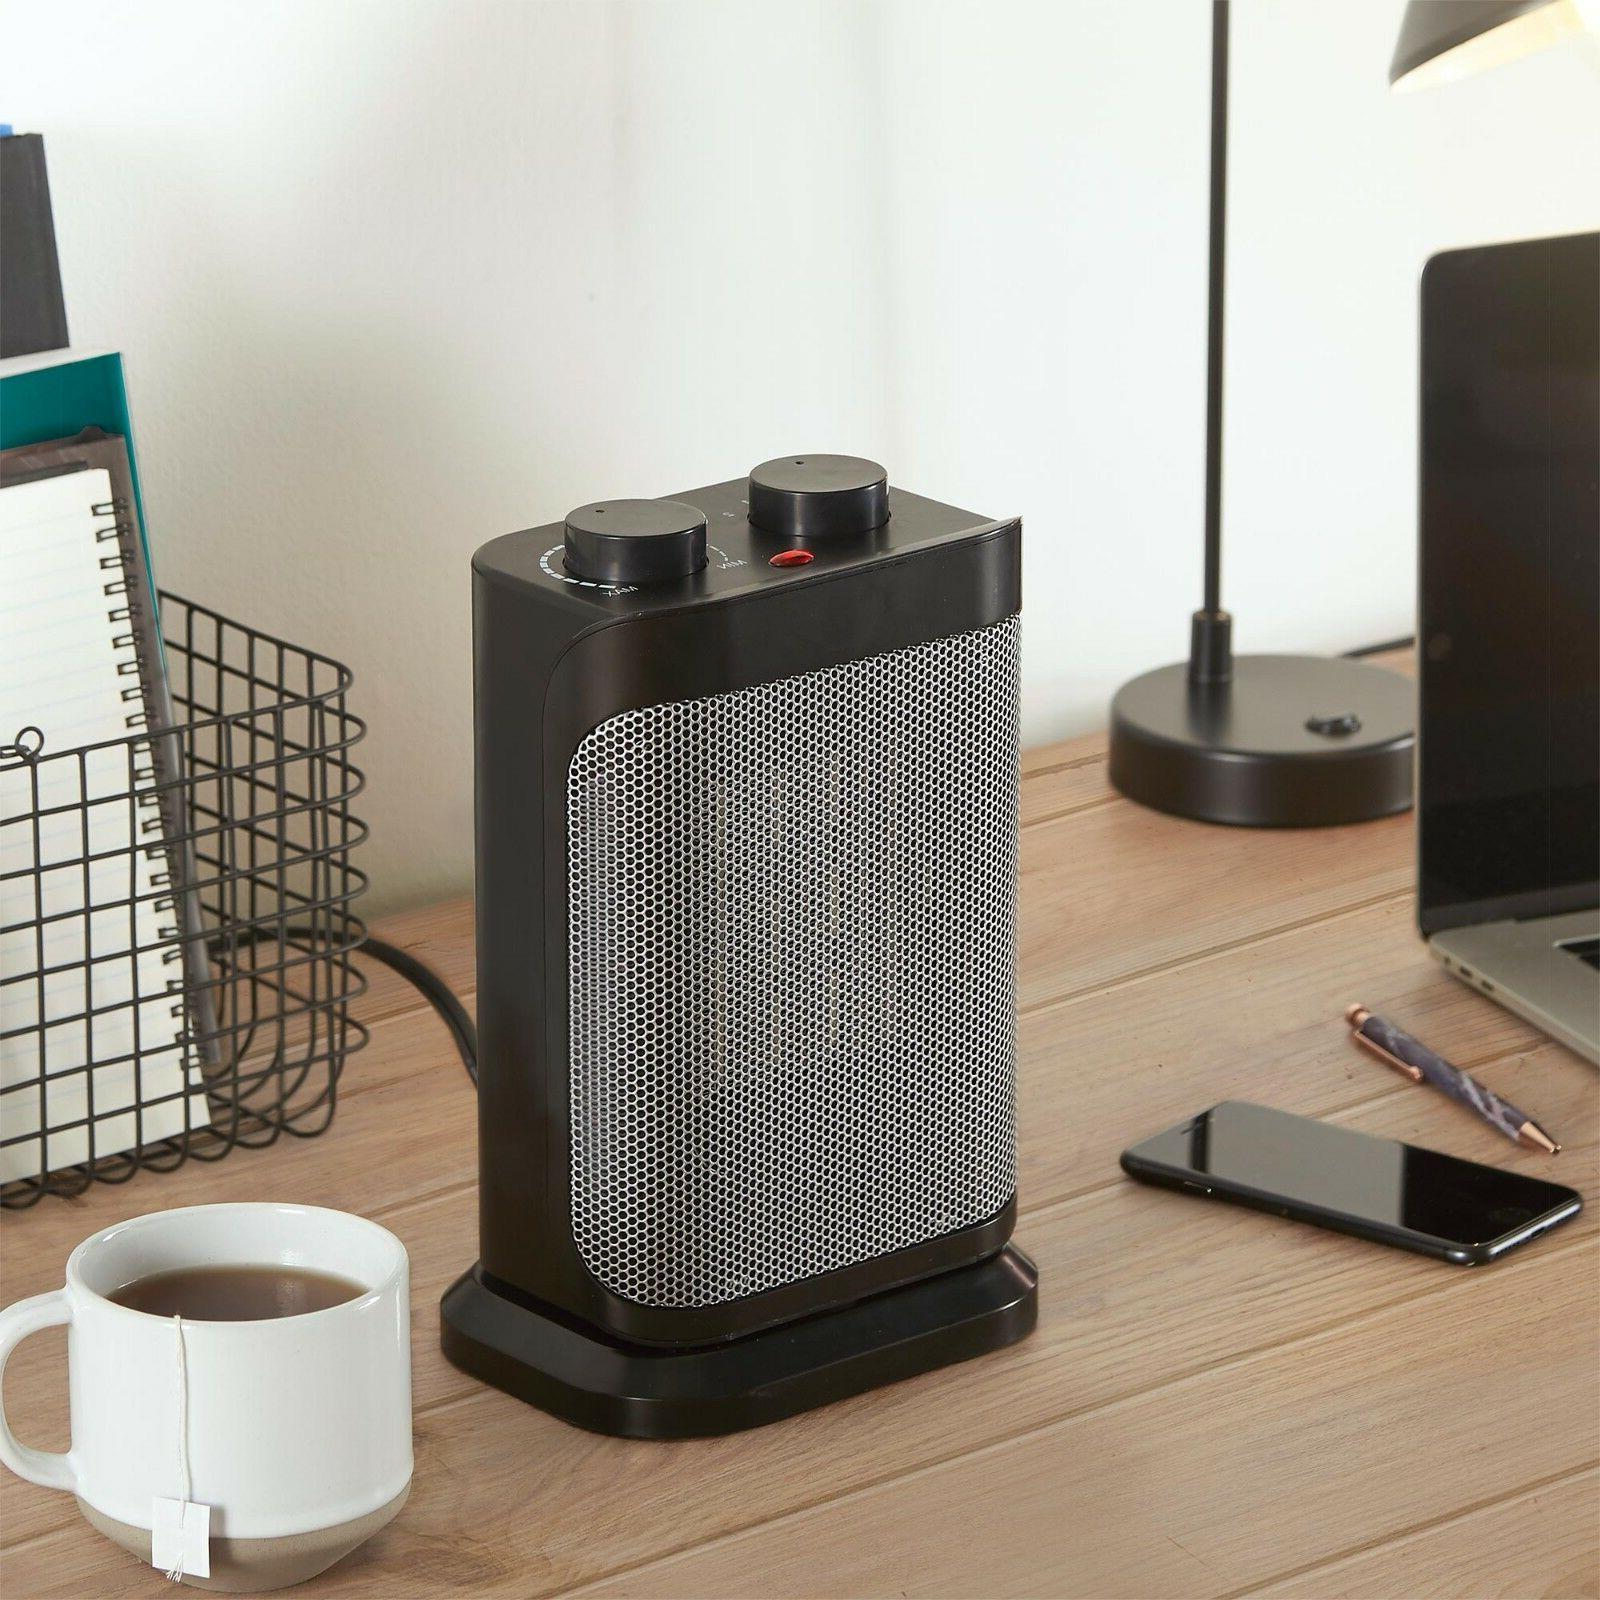 VonHaus Oscillating Electric Ceramic Space Fan Heater -1500W